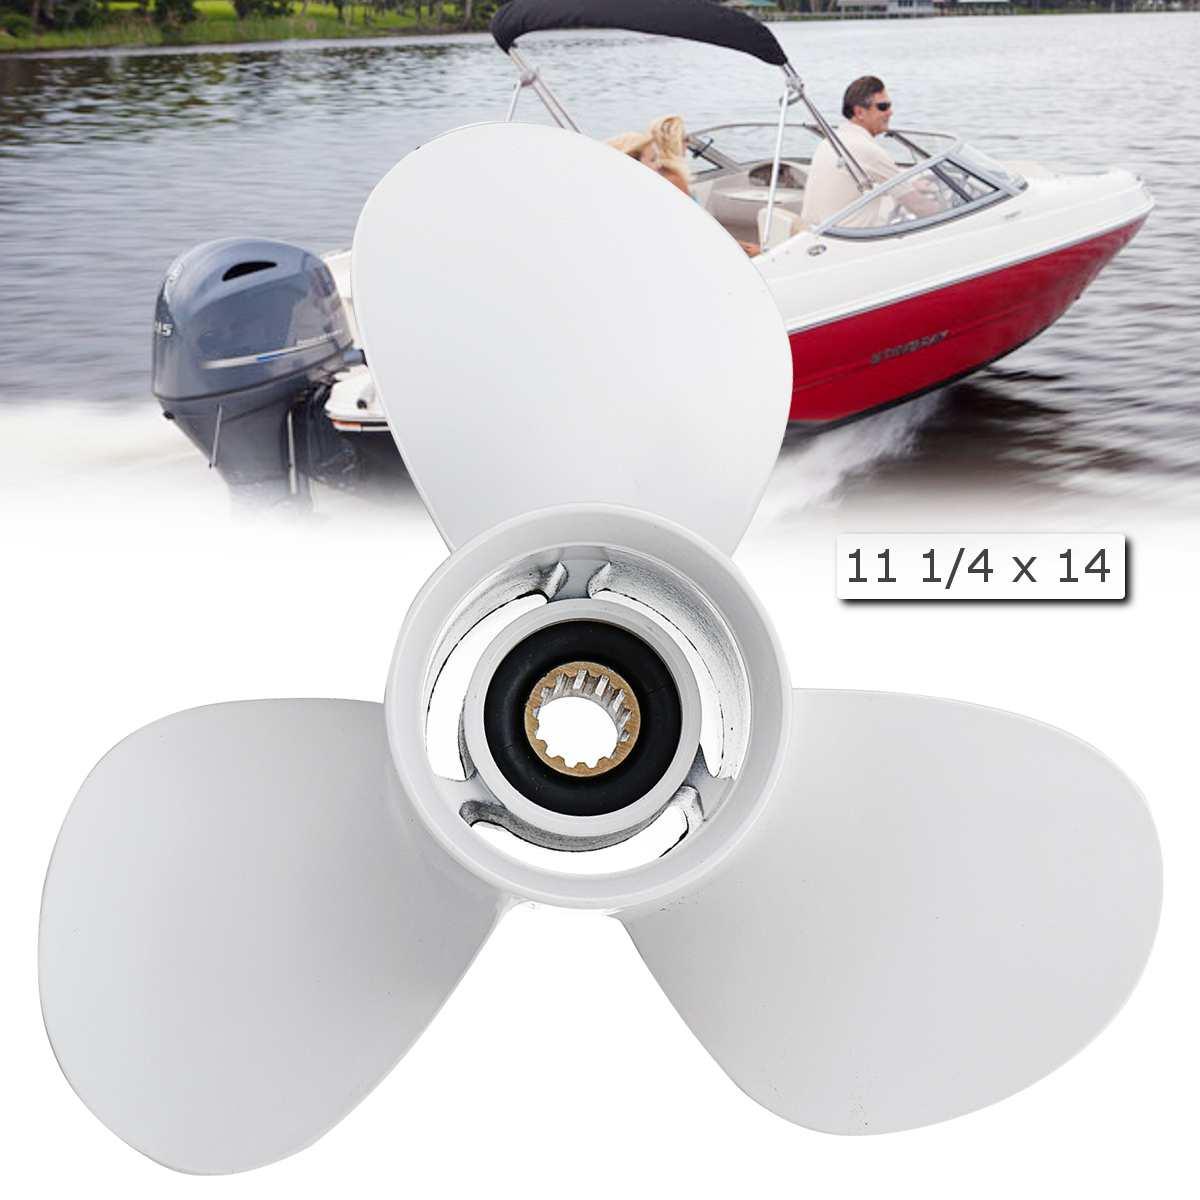 663-45958-01-EL Boat Outboard Propeller For Yamaha 25-60HP 11 1/4 x 14 Aluminum White Diameter 286mm 3 Blades 13 Spline Tooths663-45958-01-EL Boat Outboard Propeller For Yamaha 25-60HP 11 1/4 x 14 Aluminum White Diameter 286mm 3 Blades 13 Spline Tooths